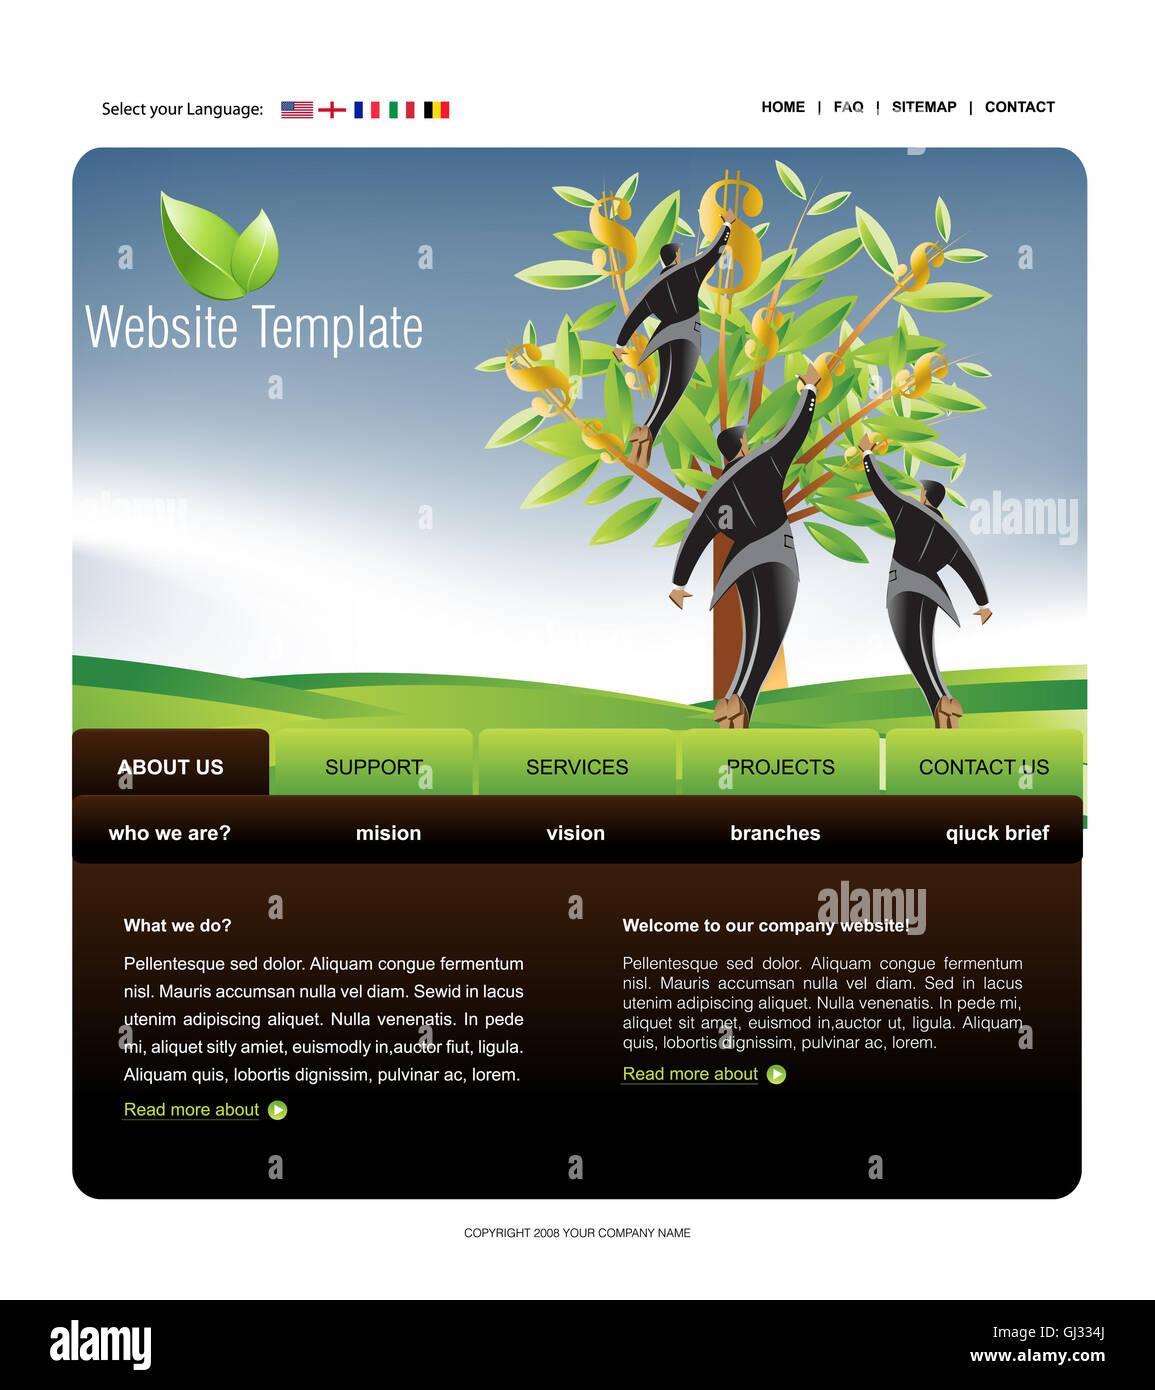 Website Template - Stock Image